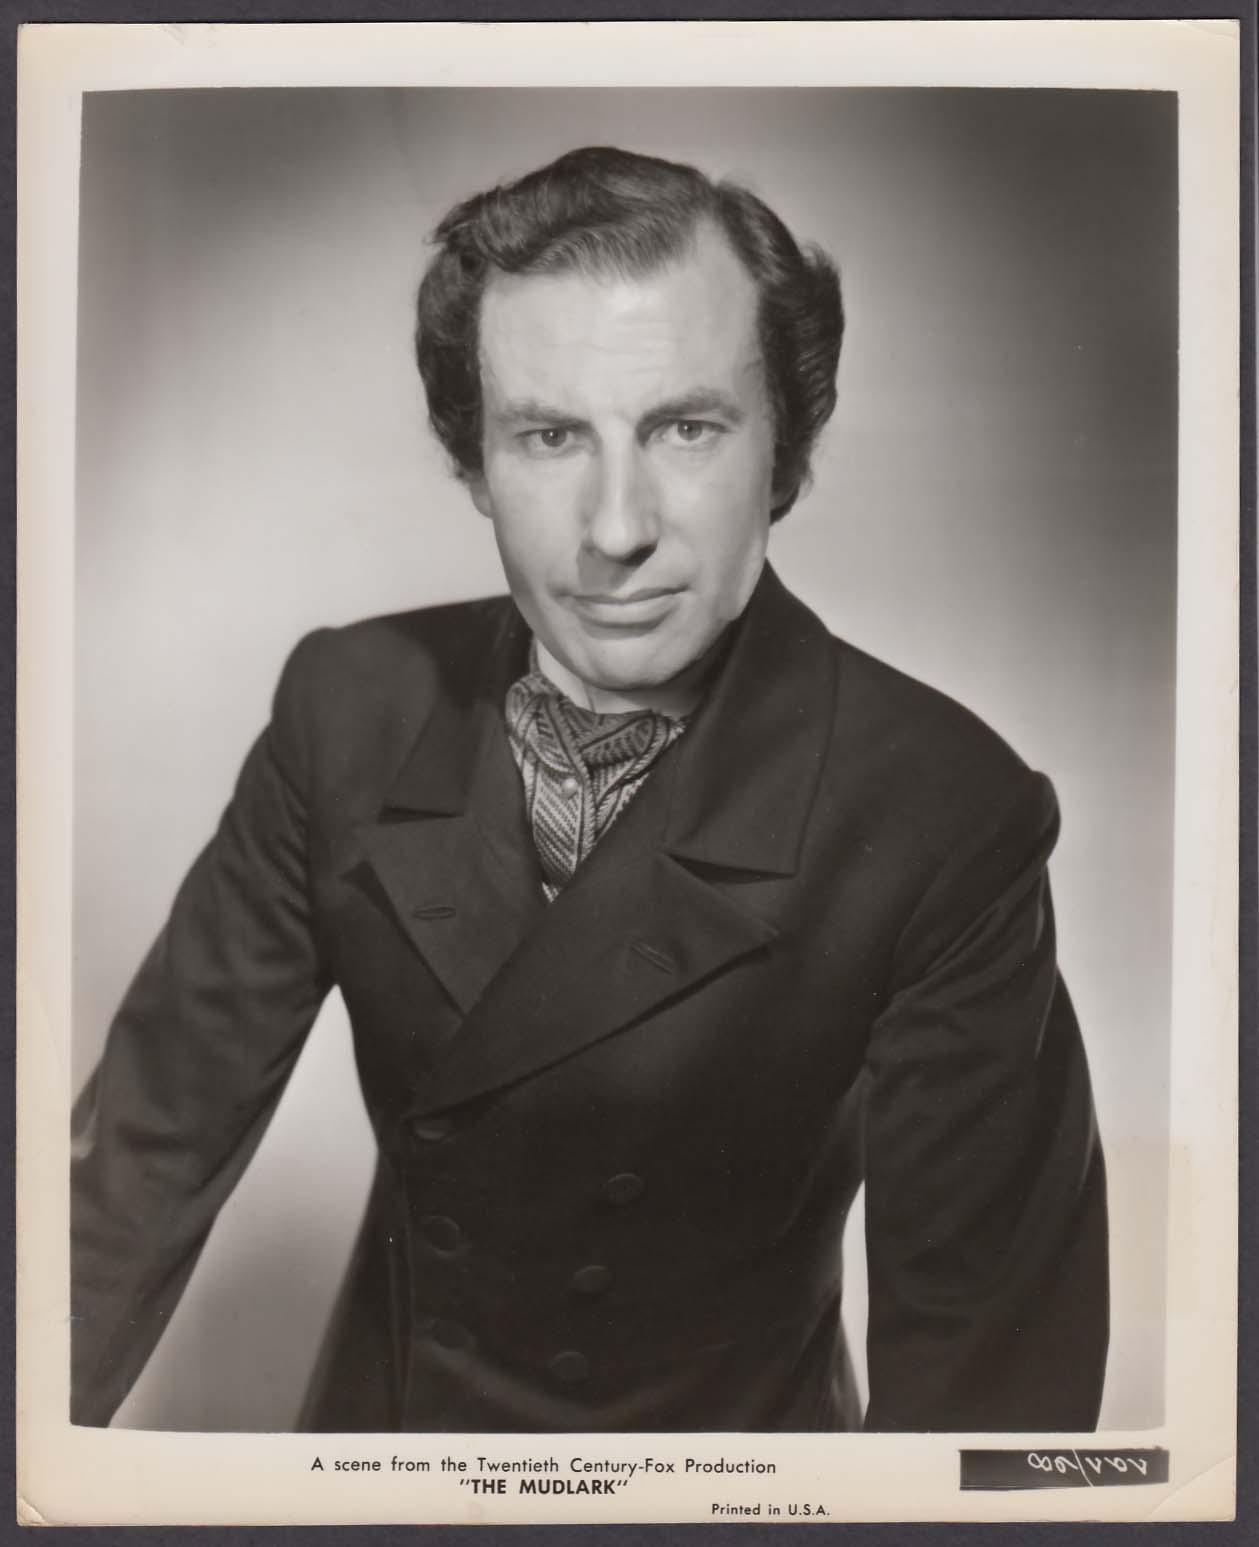 Ernest Clark as Hammond in The Mudlark 8x10 photo 1950